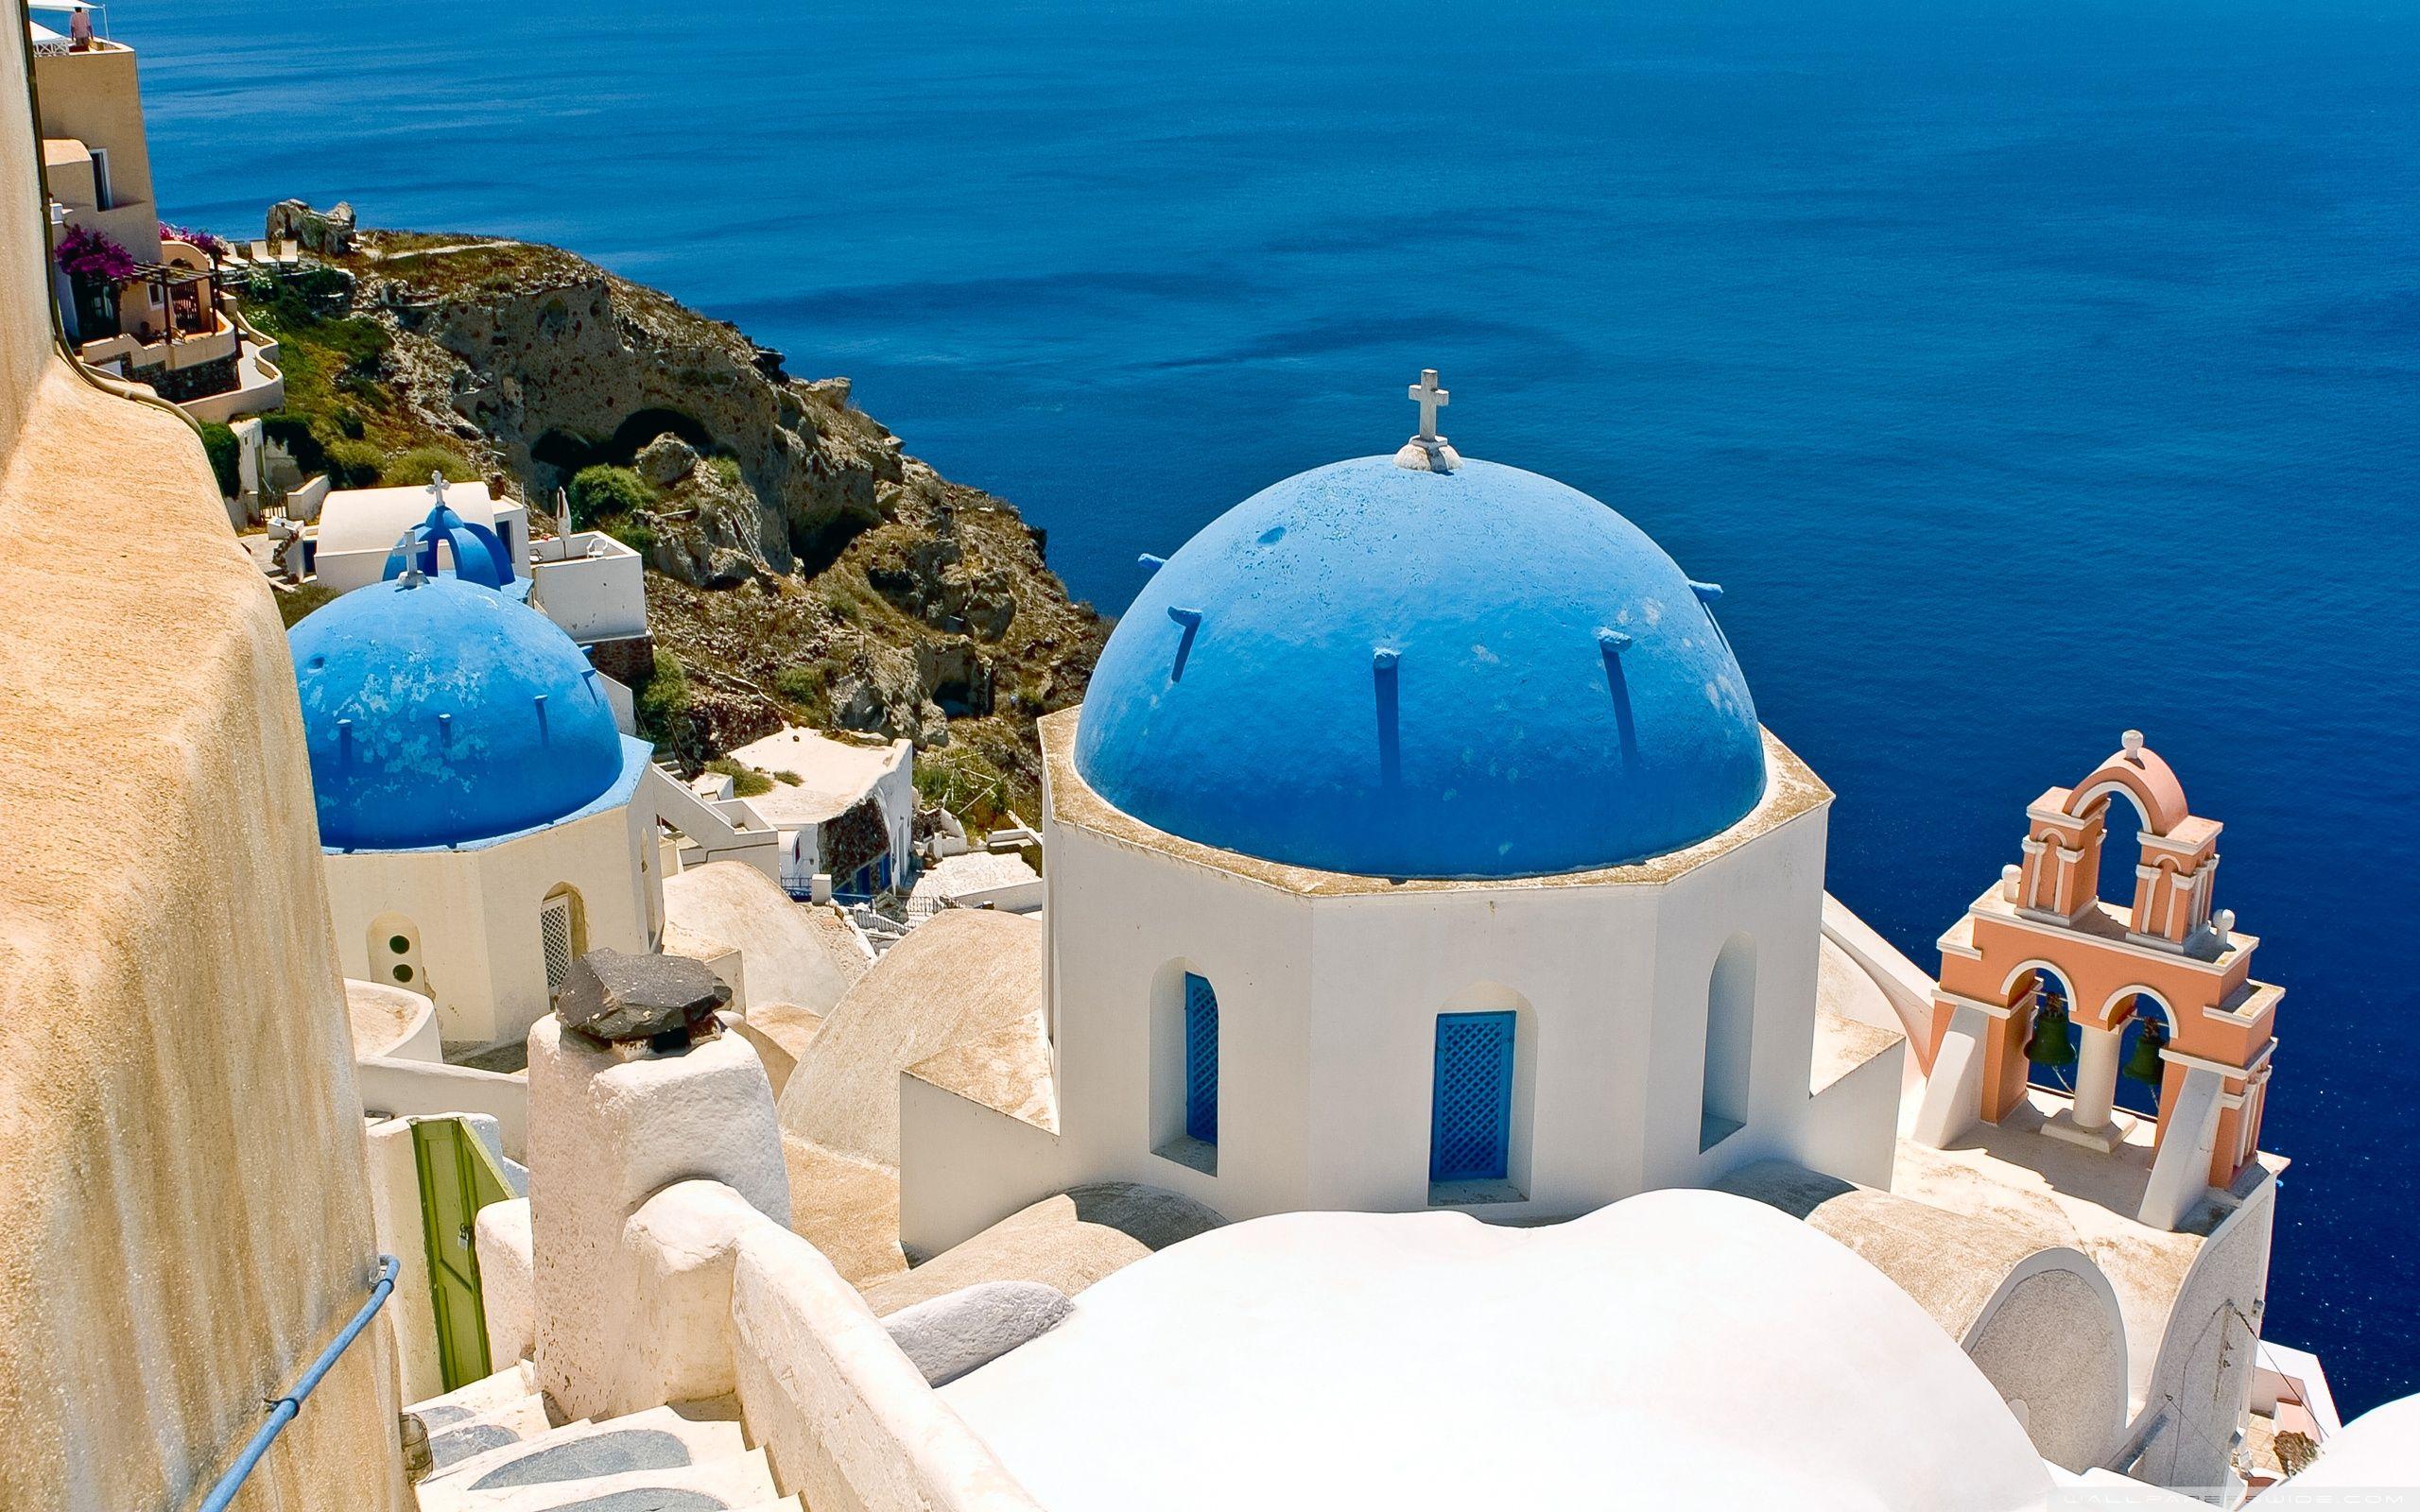 Greek Wallpaper Pretty Things Pinterest Hd Desktop And Wallpaper - Greece travel packages